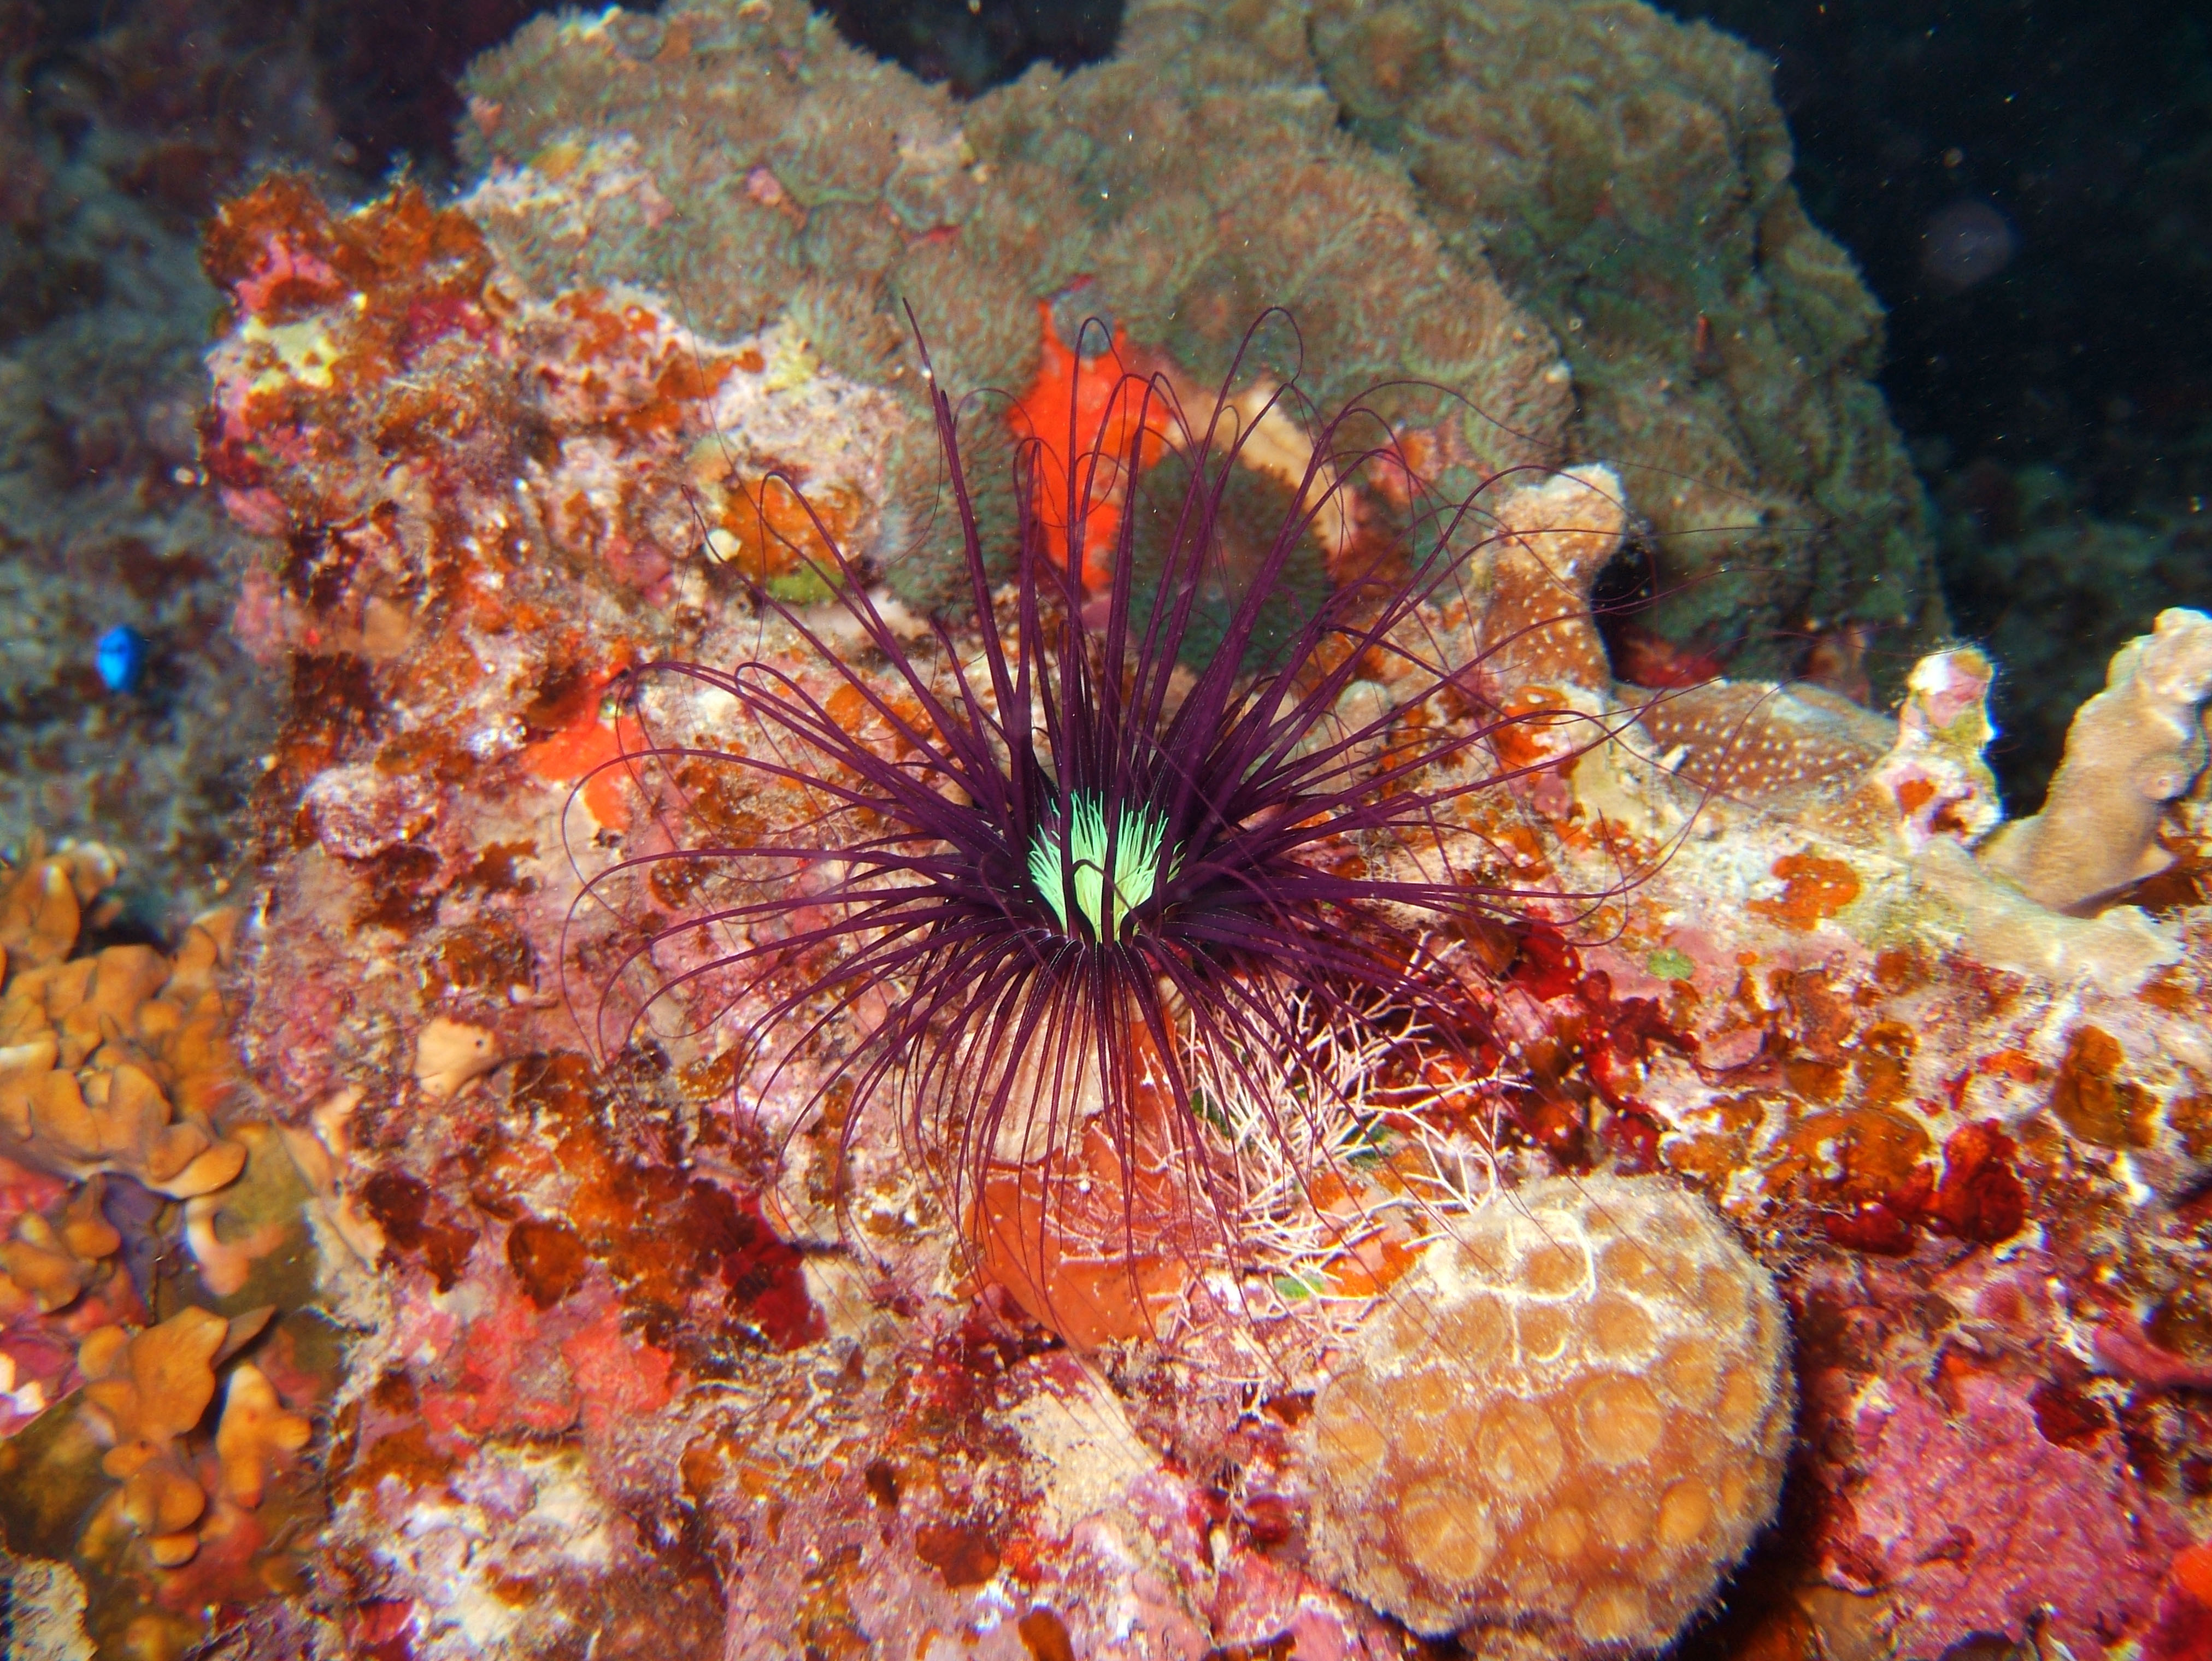 Coron dive site 11 Cay Angan Lake Baracuda Lake Reef July 2005 23